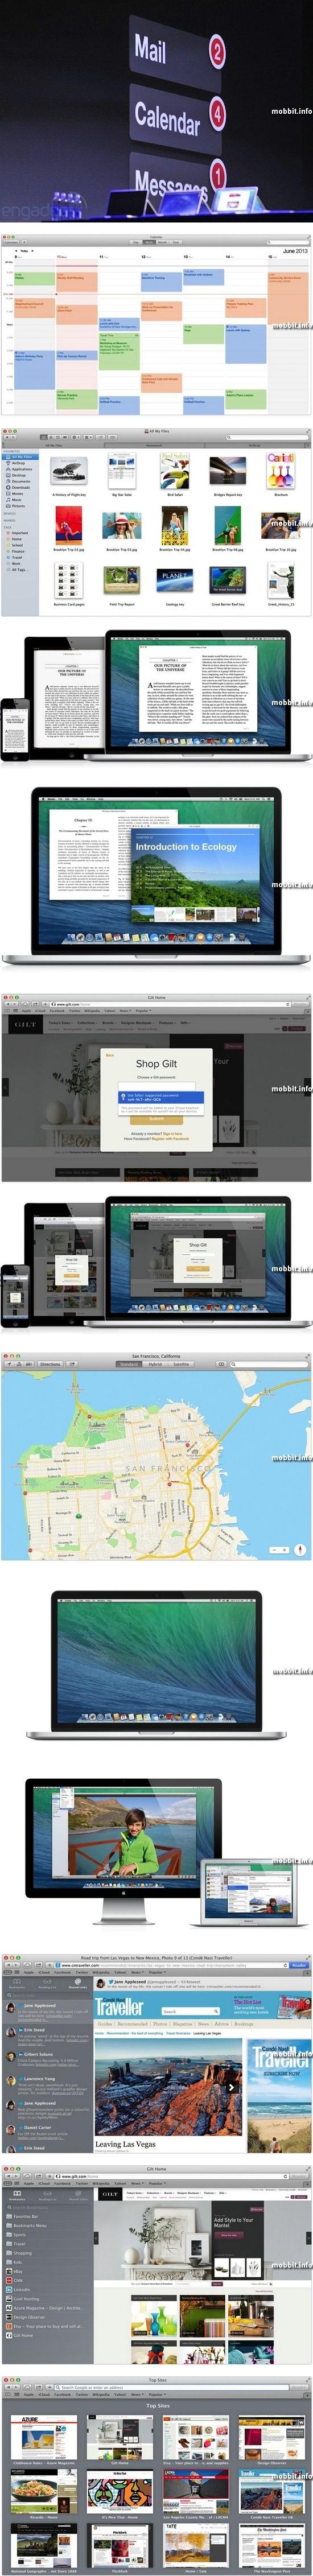 OS X Mavericks